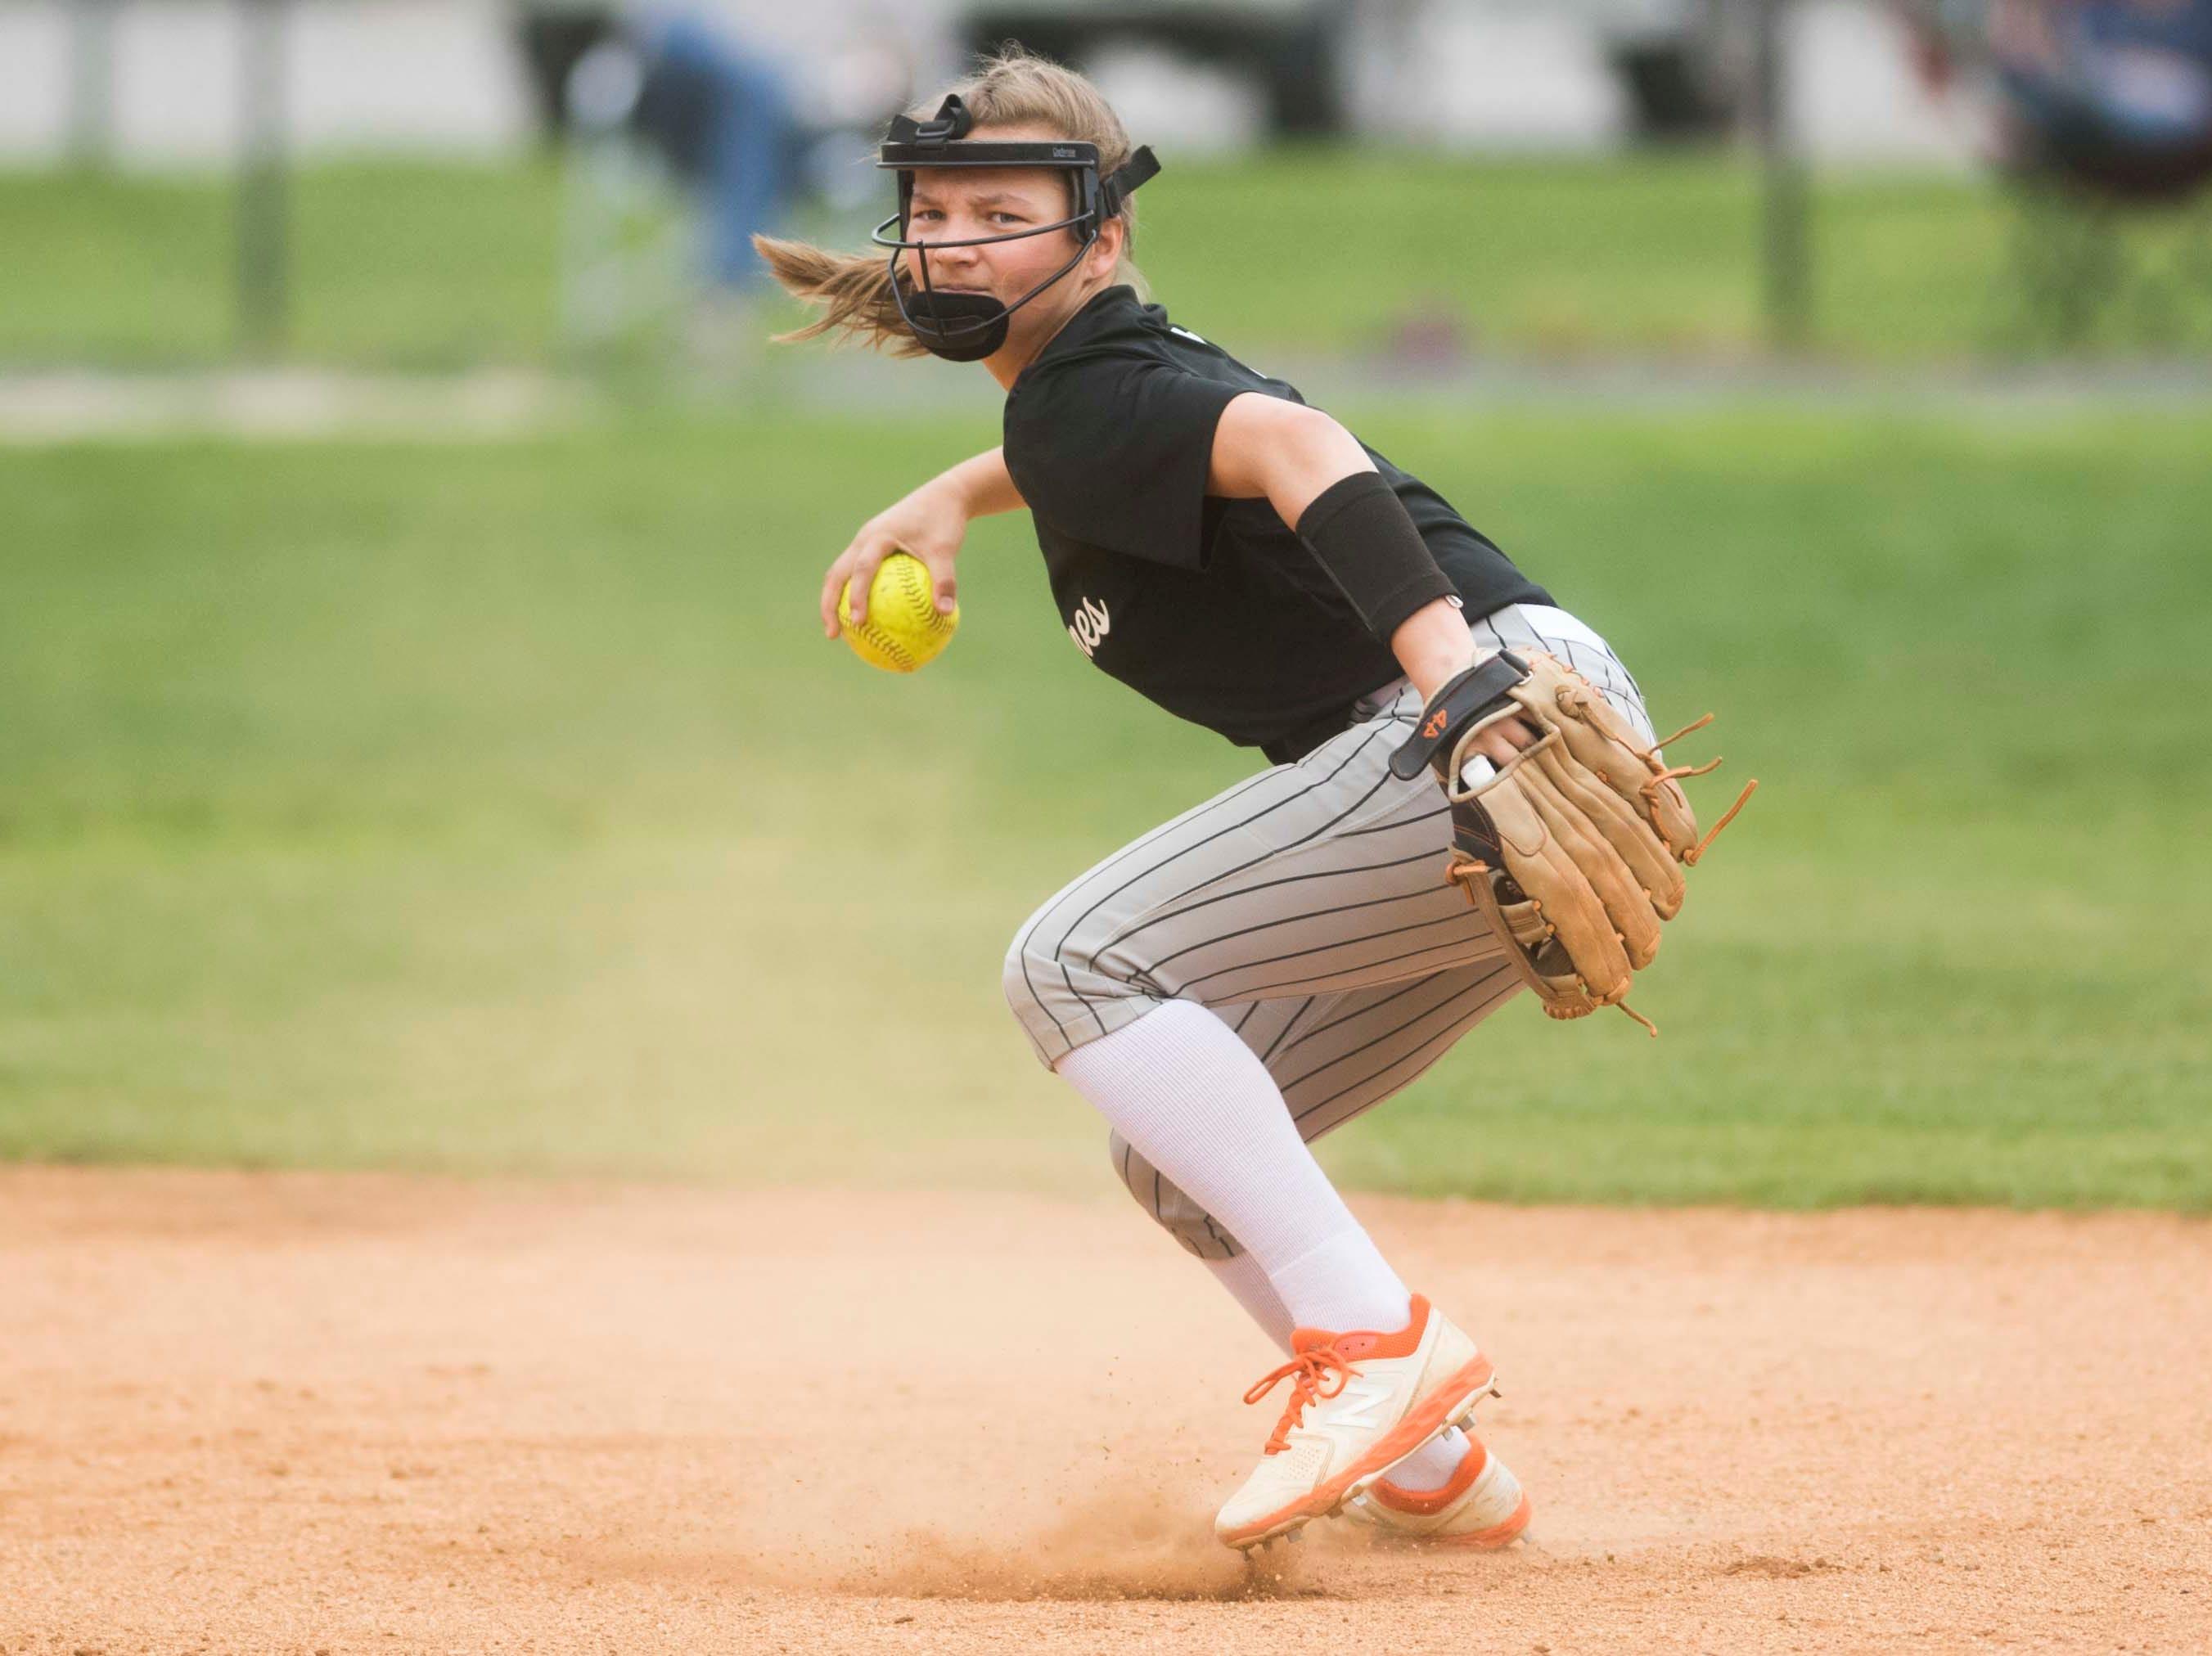 Elizabethton's Maggie Johnson (17) makes a play during a high school softball game between Halls and Elizabethton at Halls Friday, April 12, 2019. Halls defeated Elizabethton.